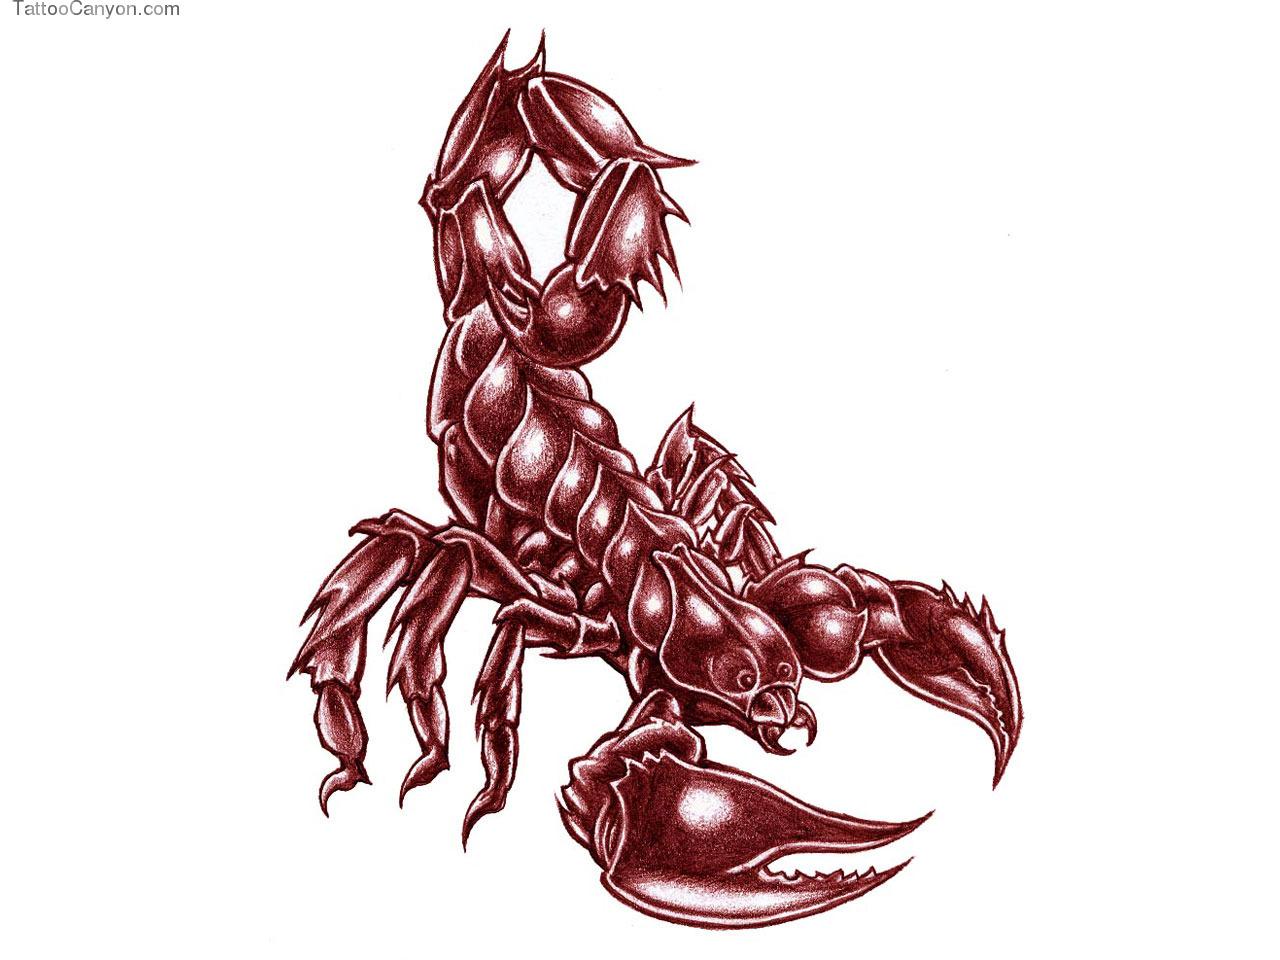 Designs Big Bold Scorpion Tattoo Wallpaper Picture 5610 1280x960